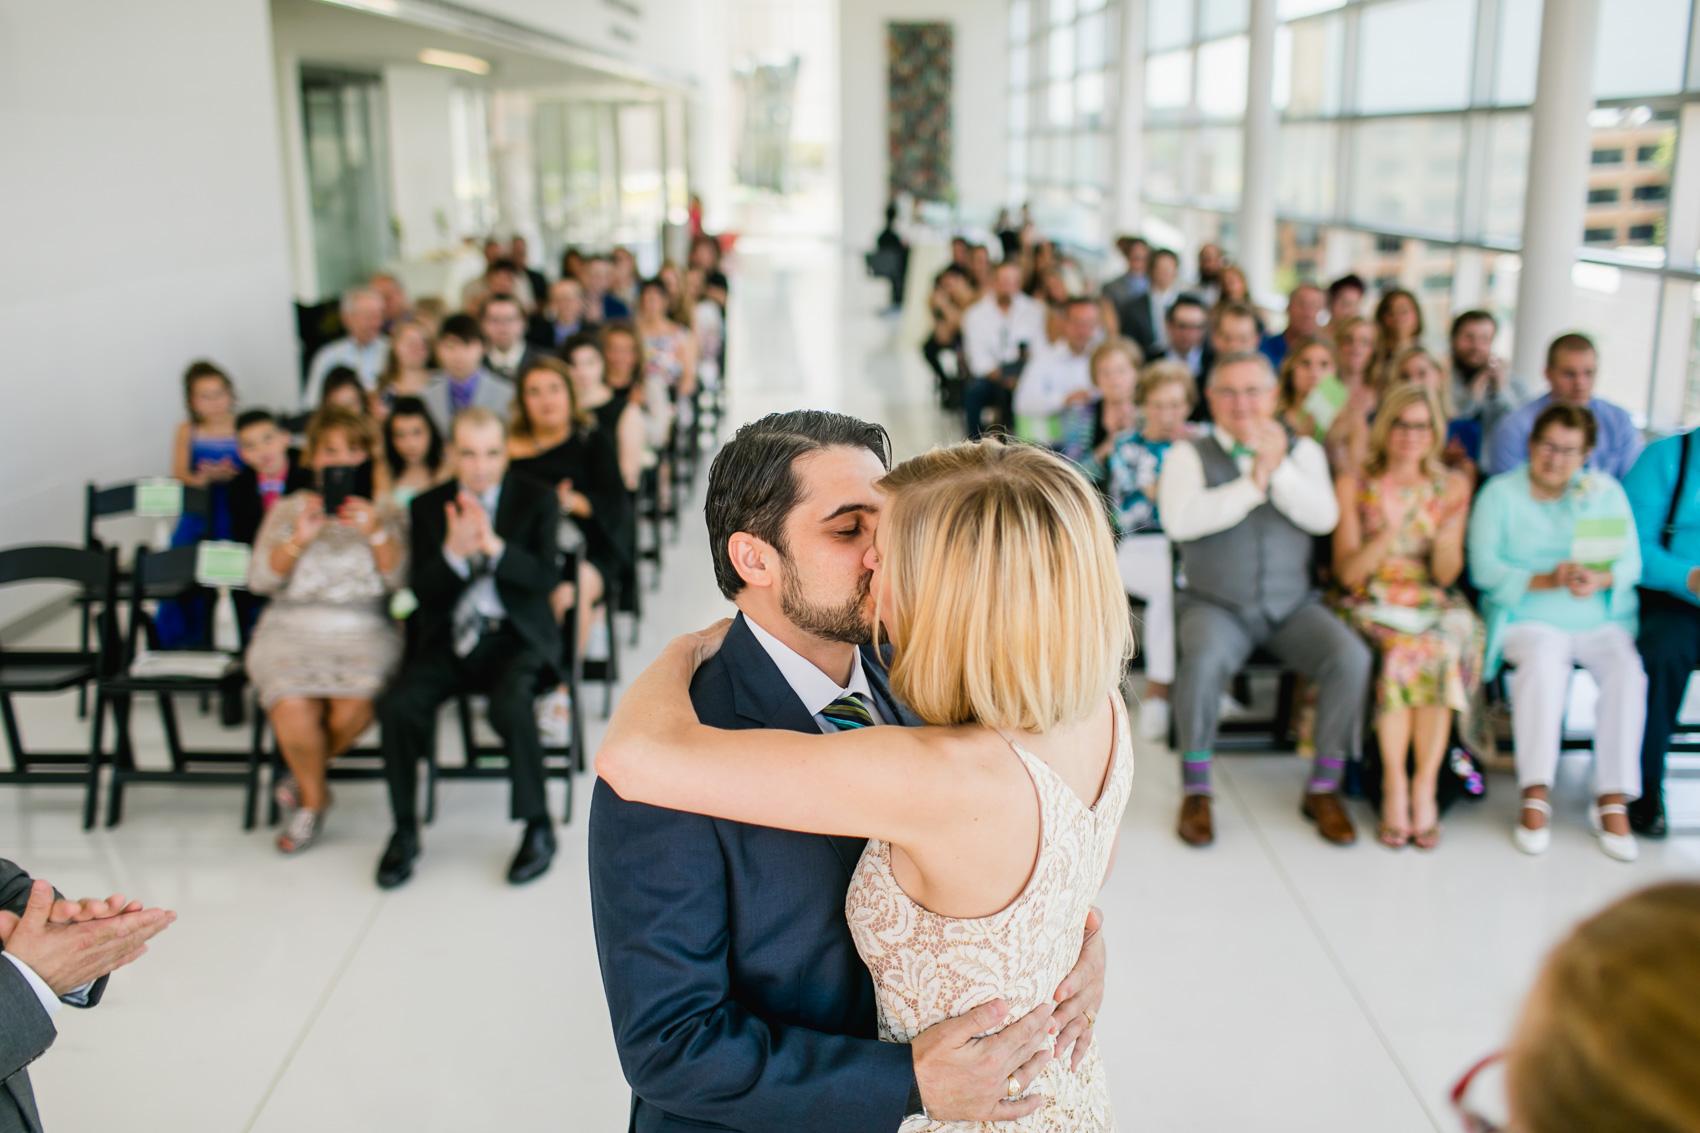 madison-public-library-wedding-4.jpg